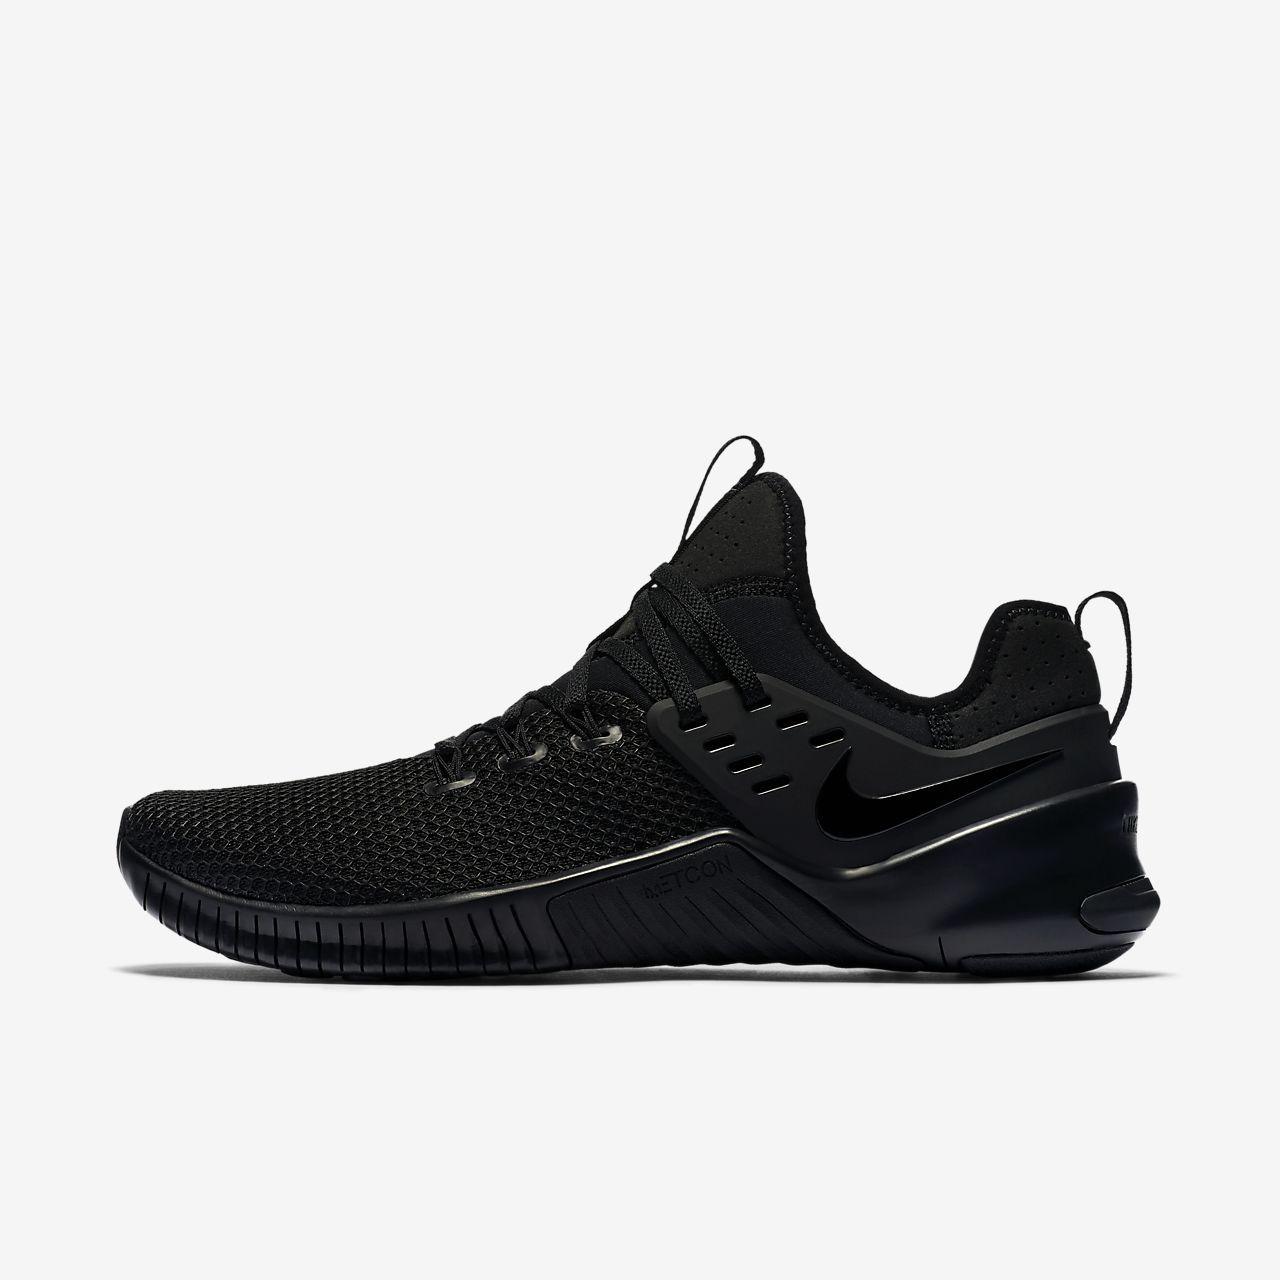 timeless design 0eadd 21469 Nike Free x Metcon Gym Cross Training Shoe Black Black Black size 12